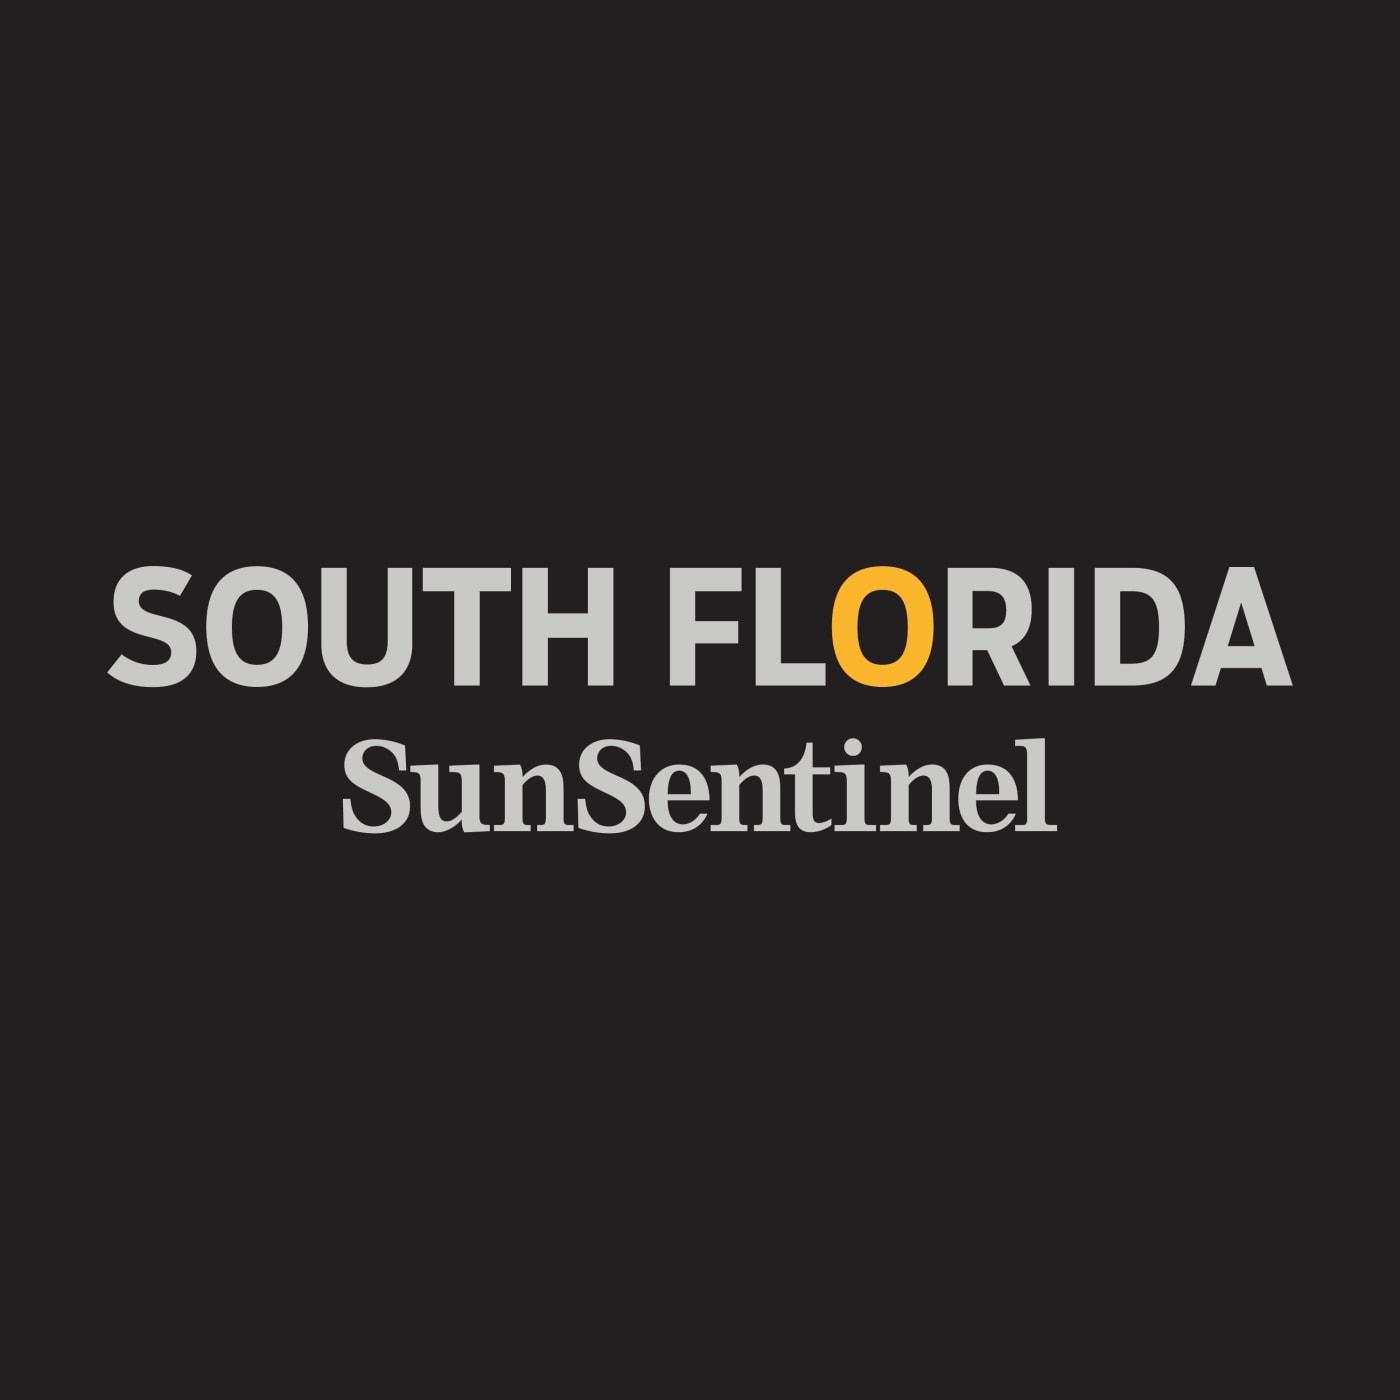 South Florida Sun Sentinel, Wednesday, Oct. 20, 2021